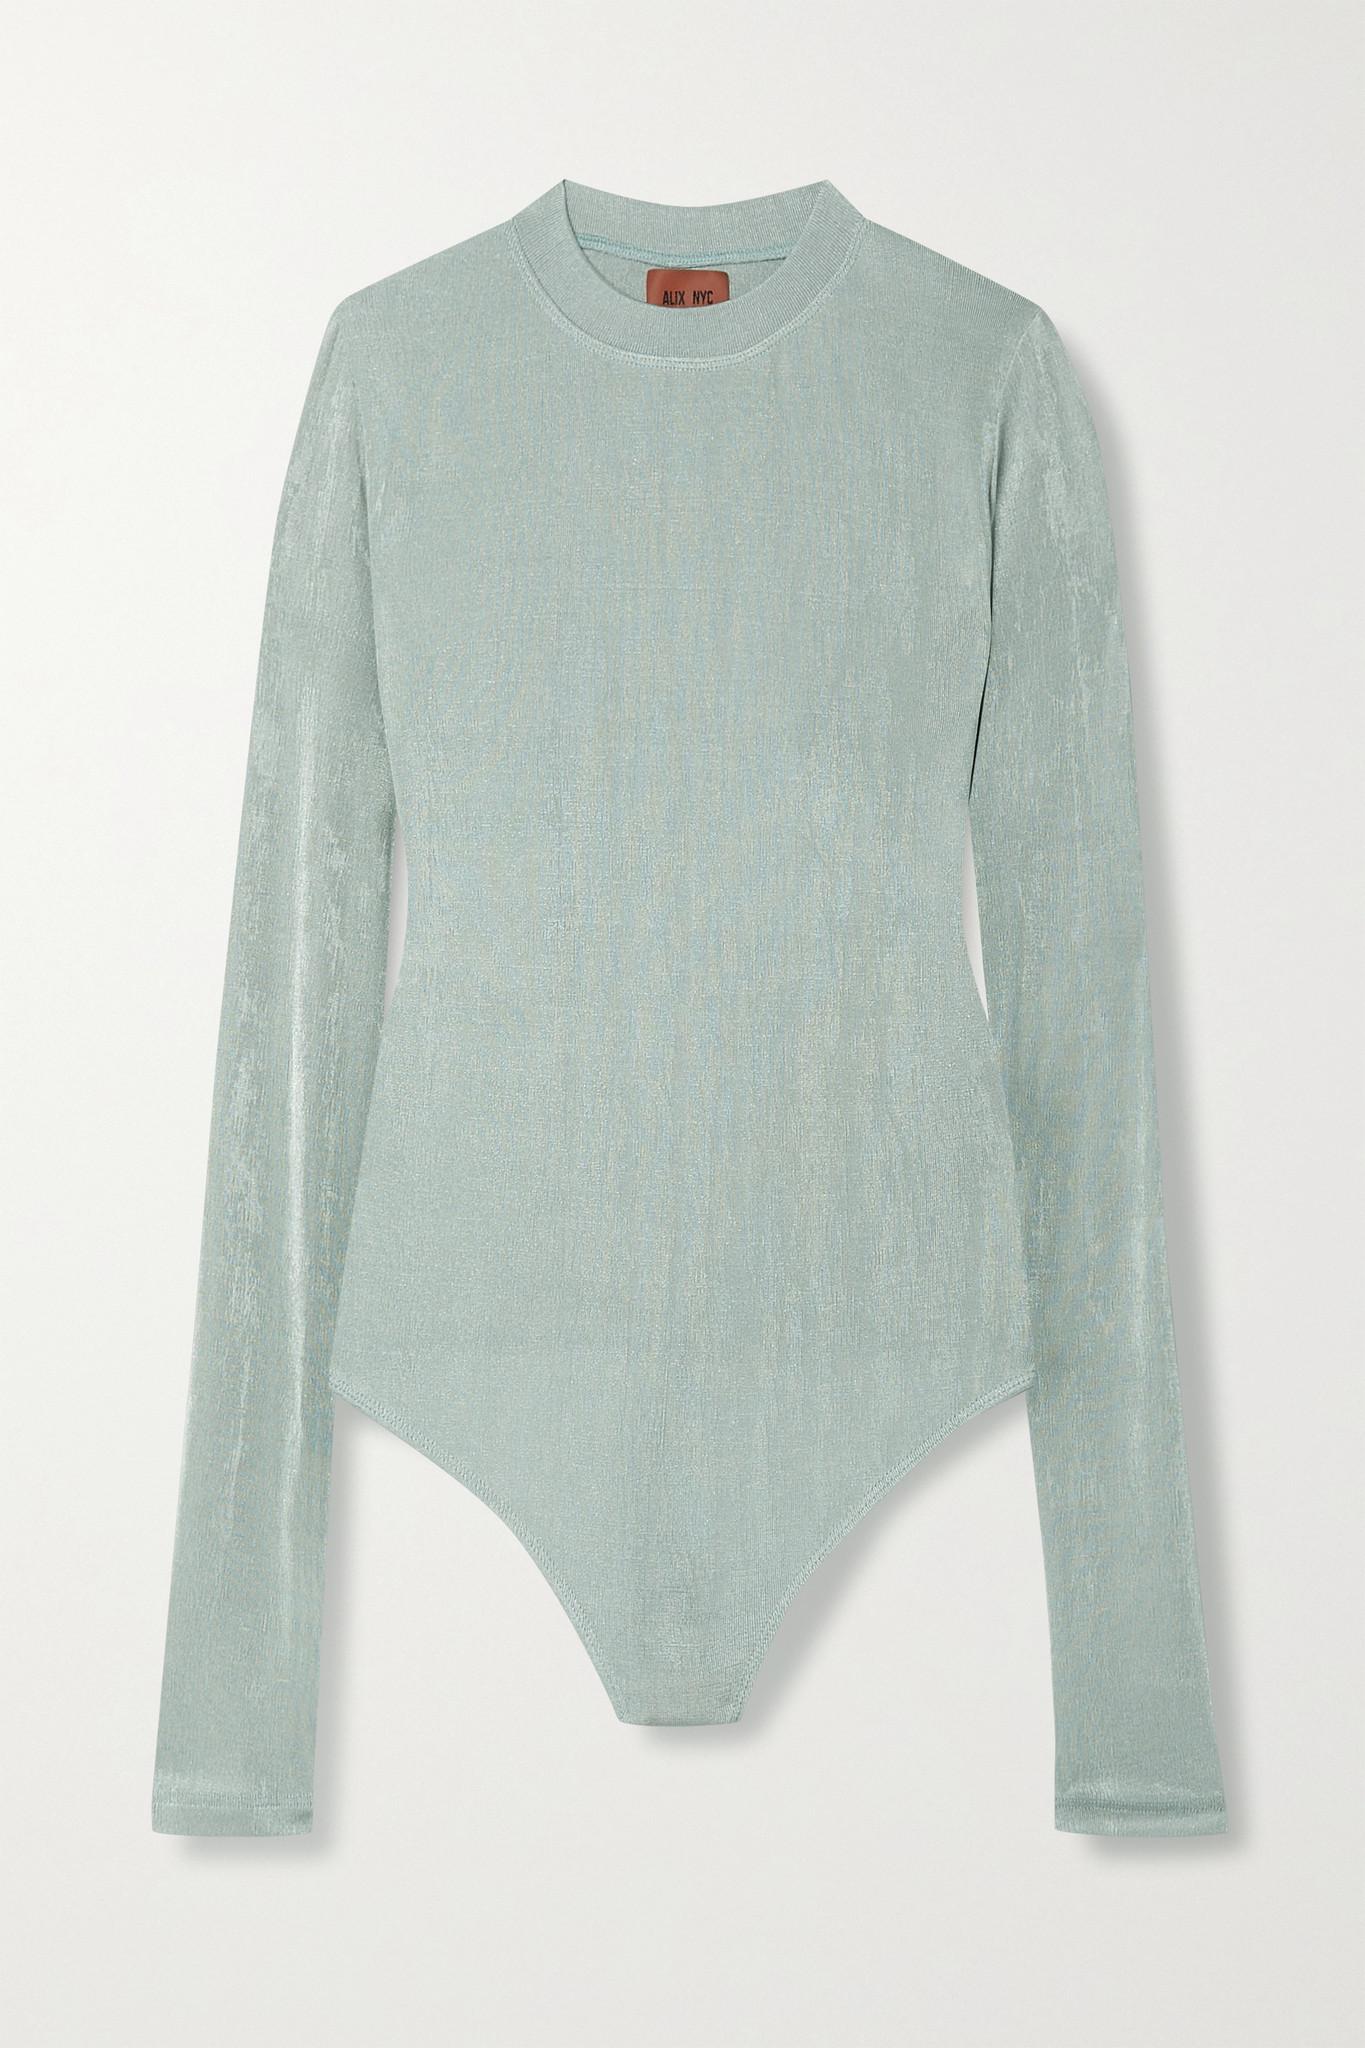 ALIX NYC - Layton Cutout Metallic Stretch-jersey Thong Bodysuit - Silver - medium